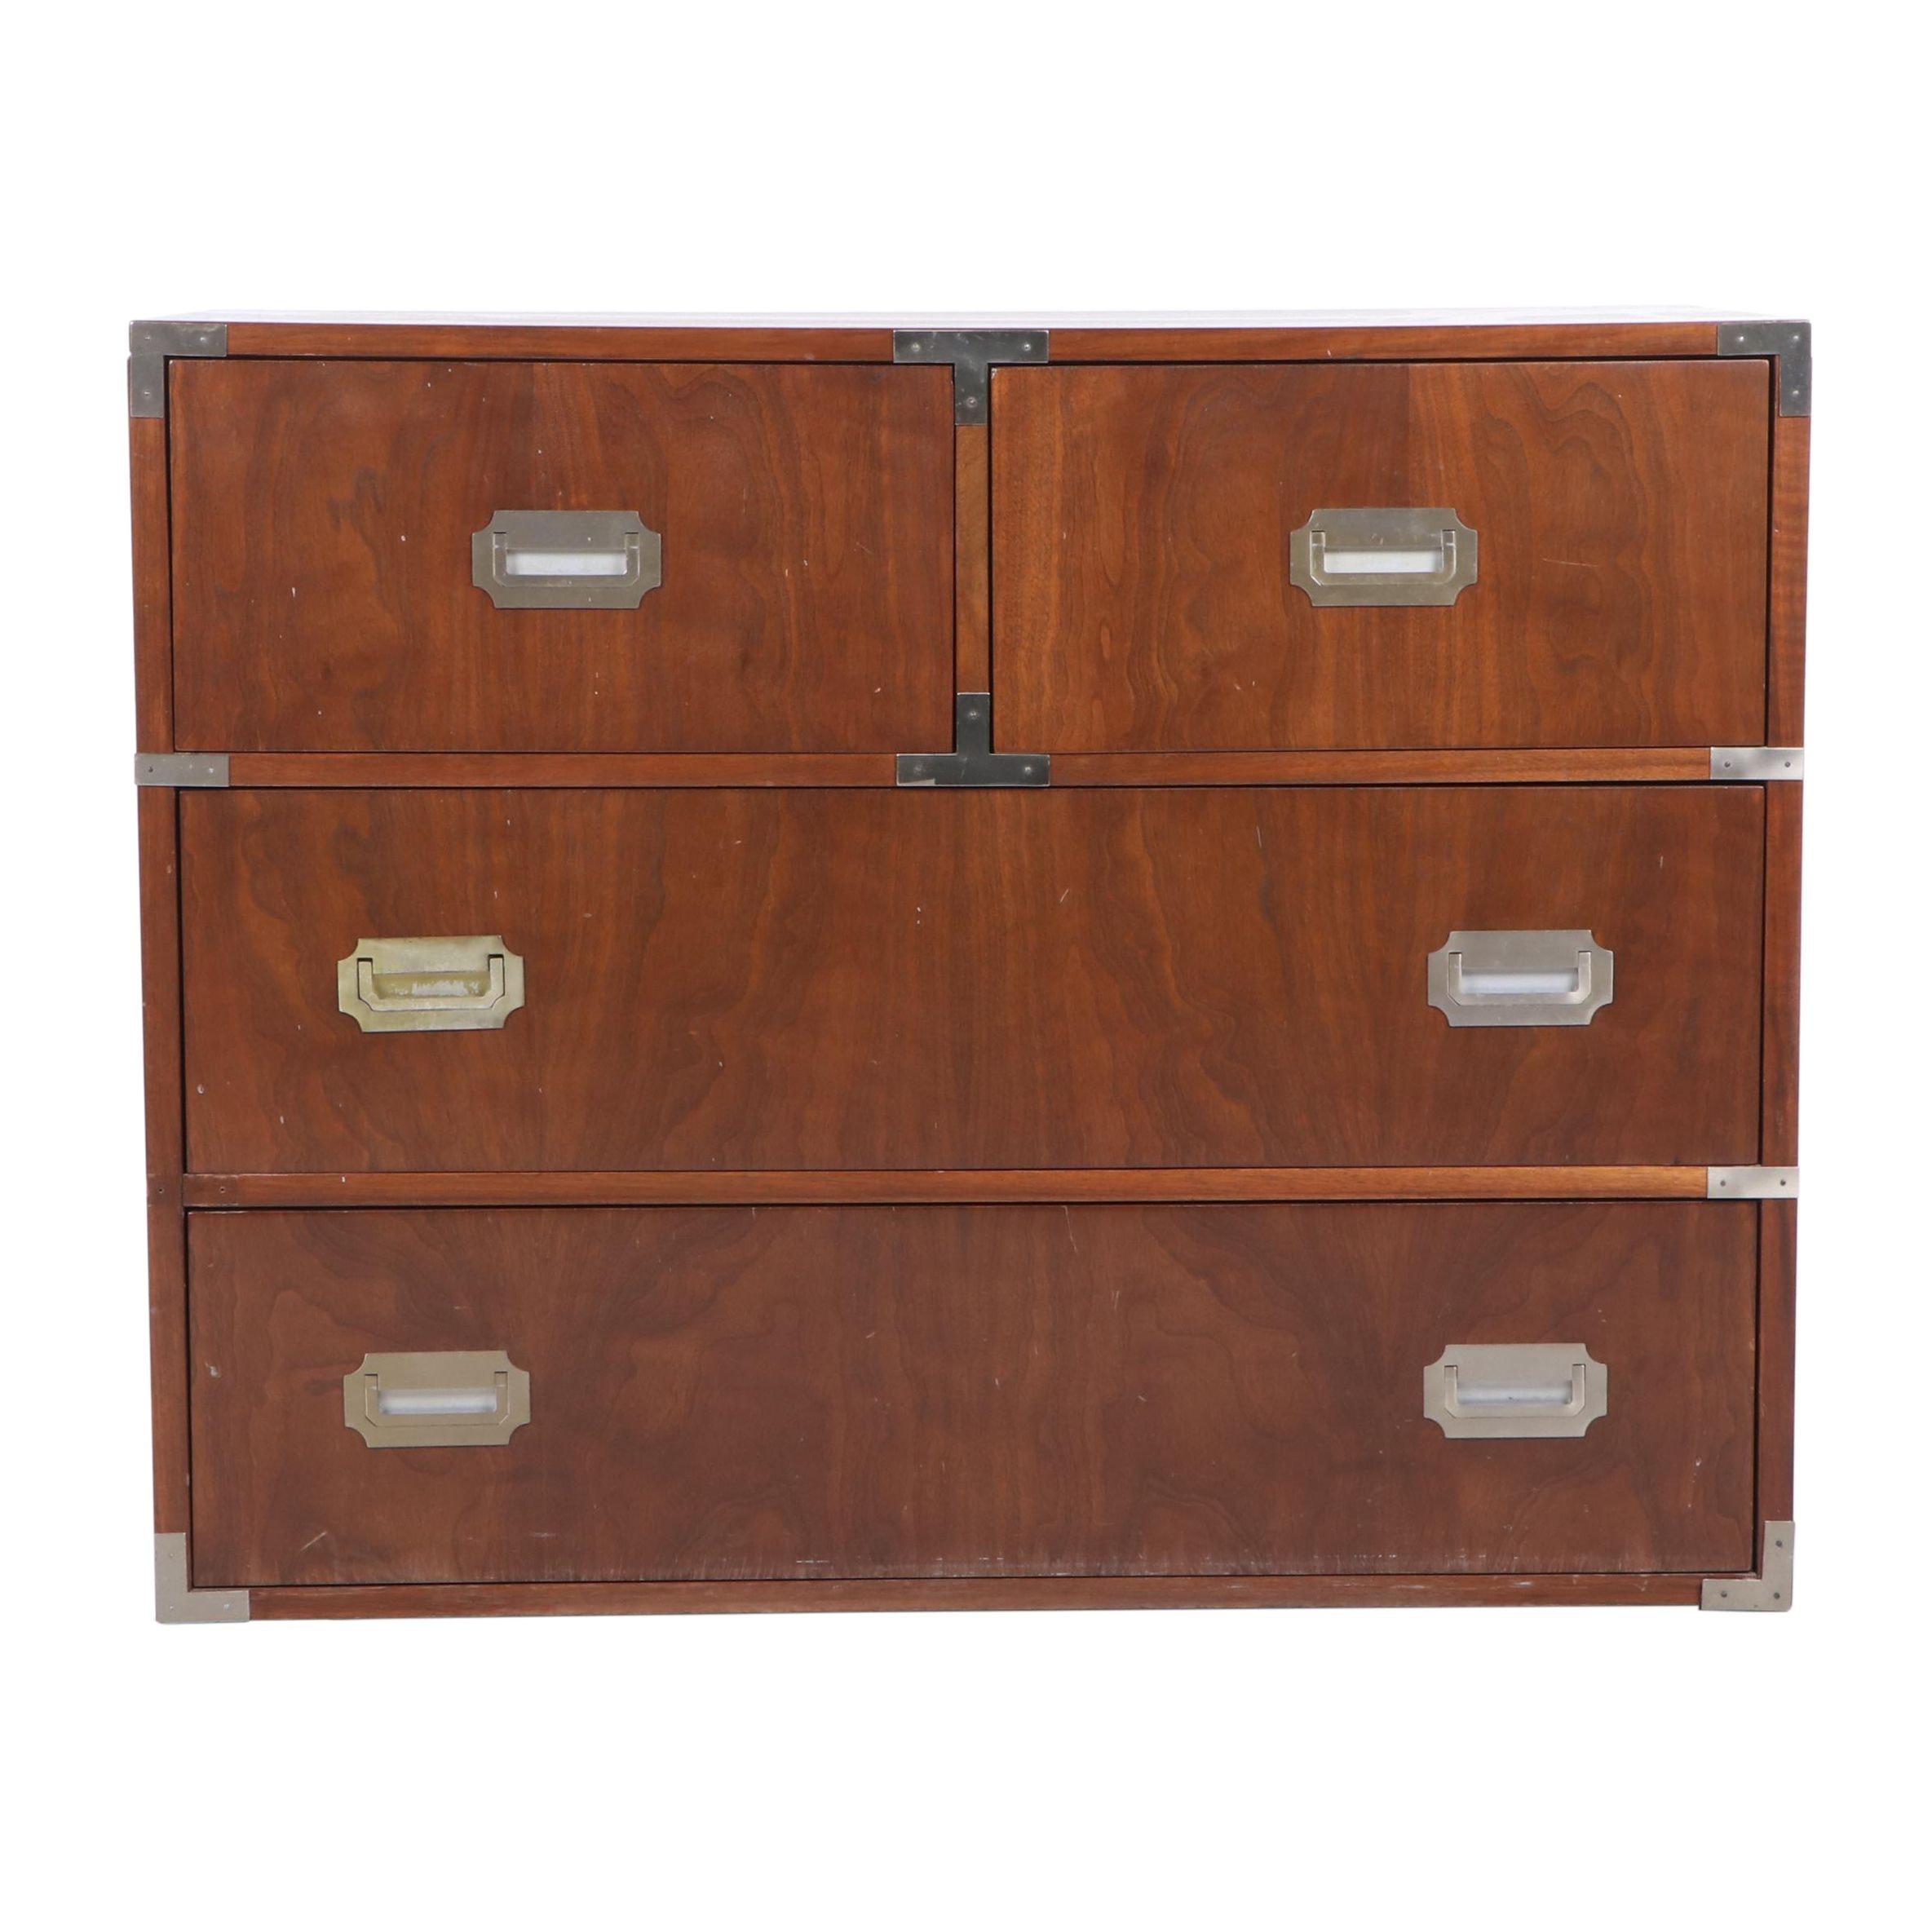 Walnut Campaign Style Dresser, Mid 20th Century